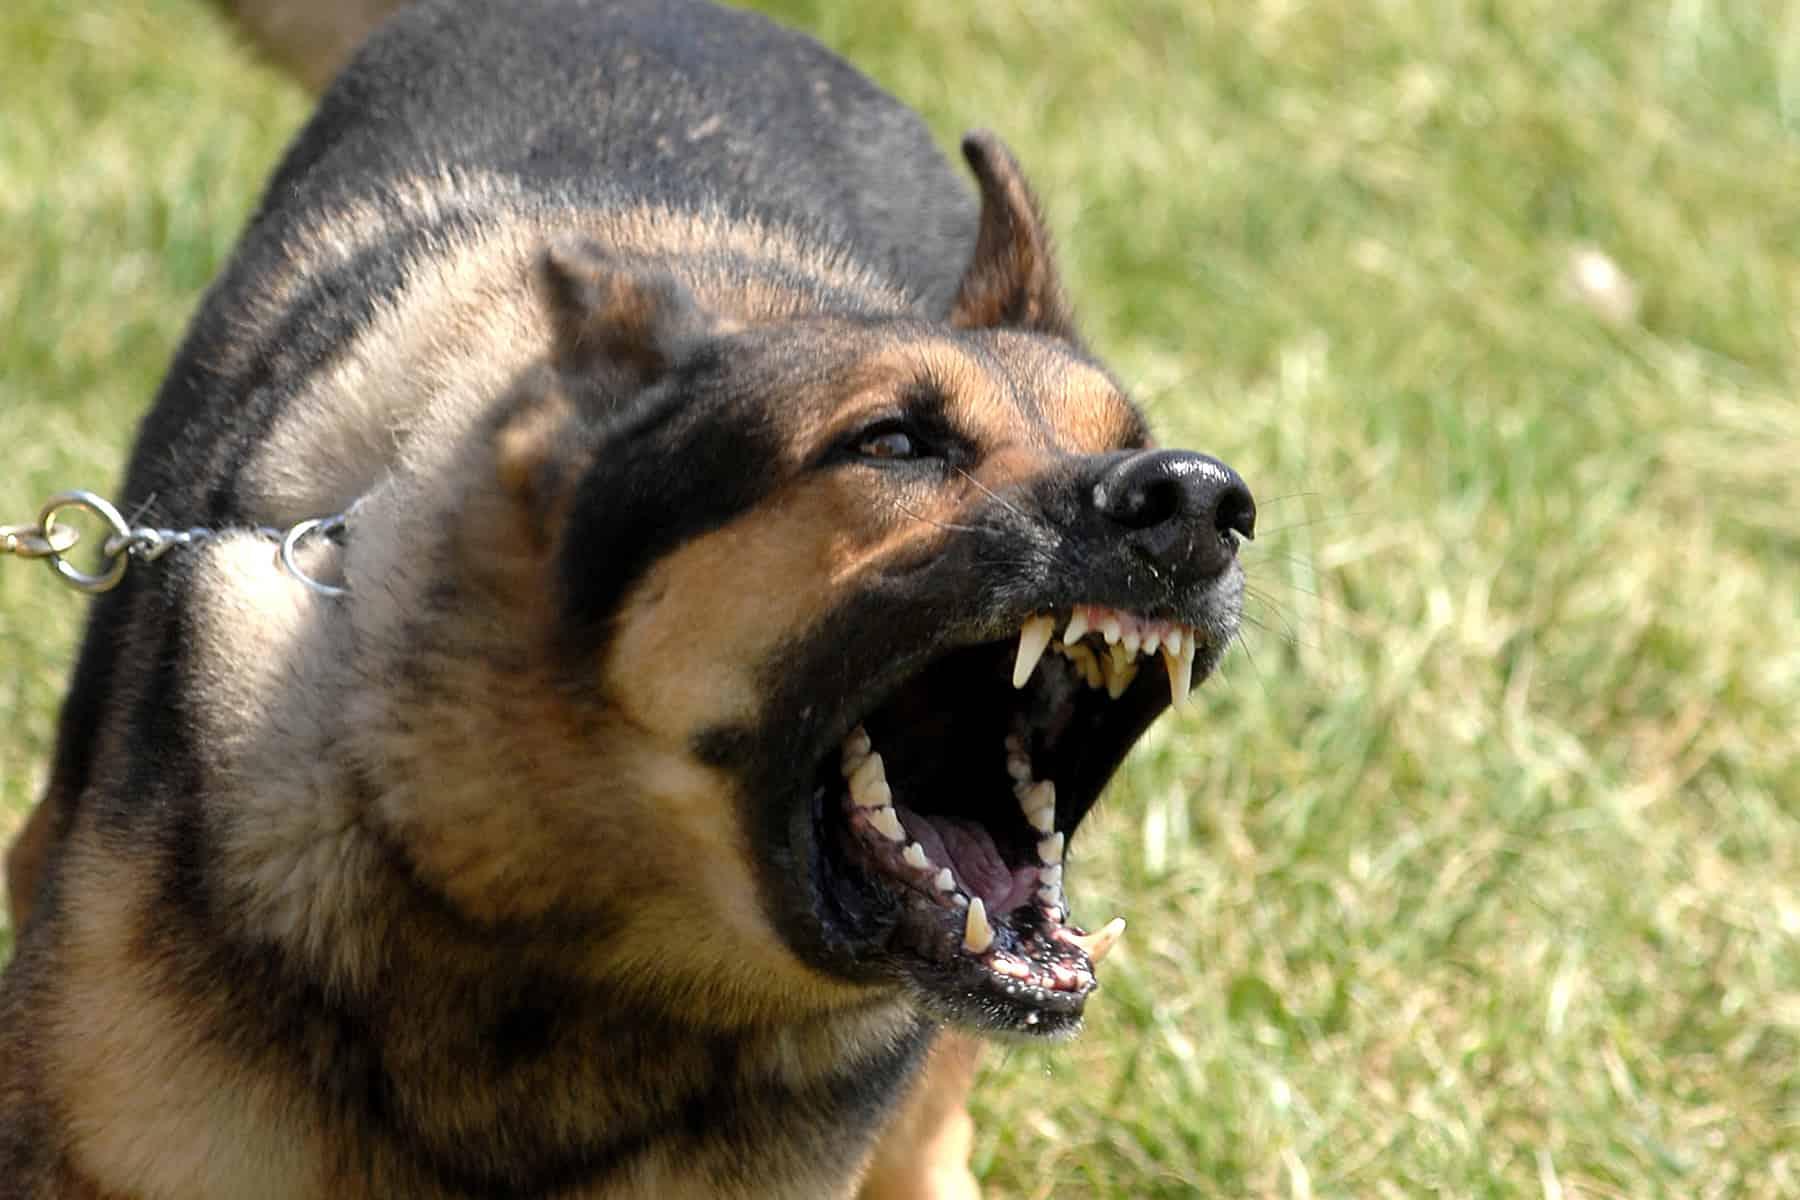 dogs, teach your dog to speak, dog barking